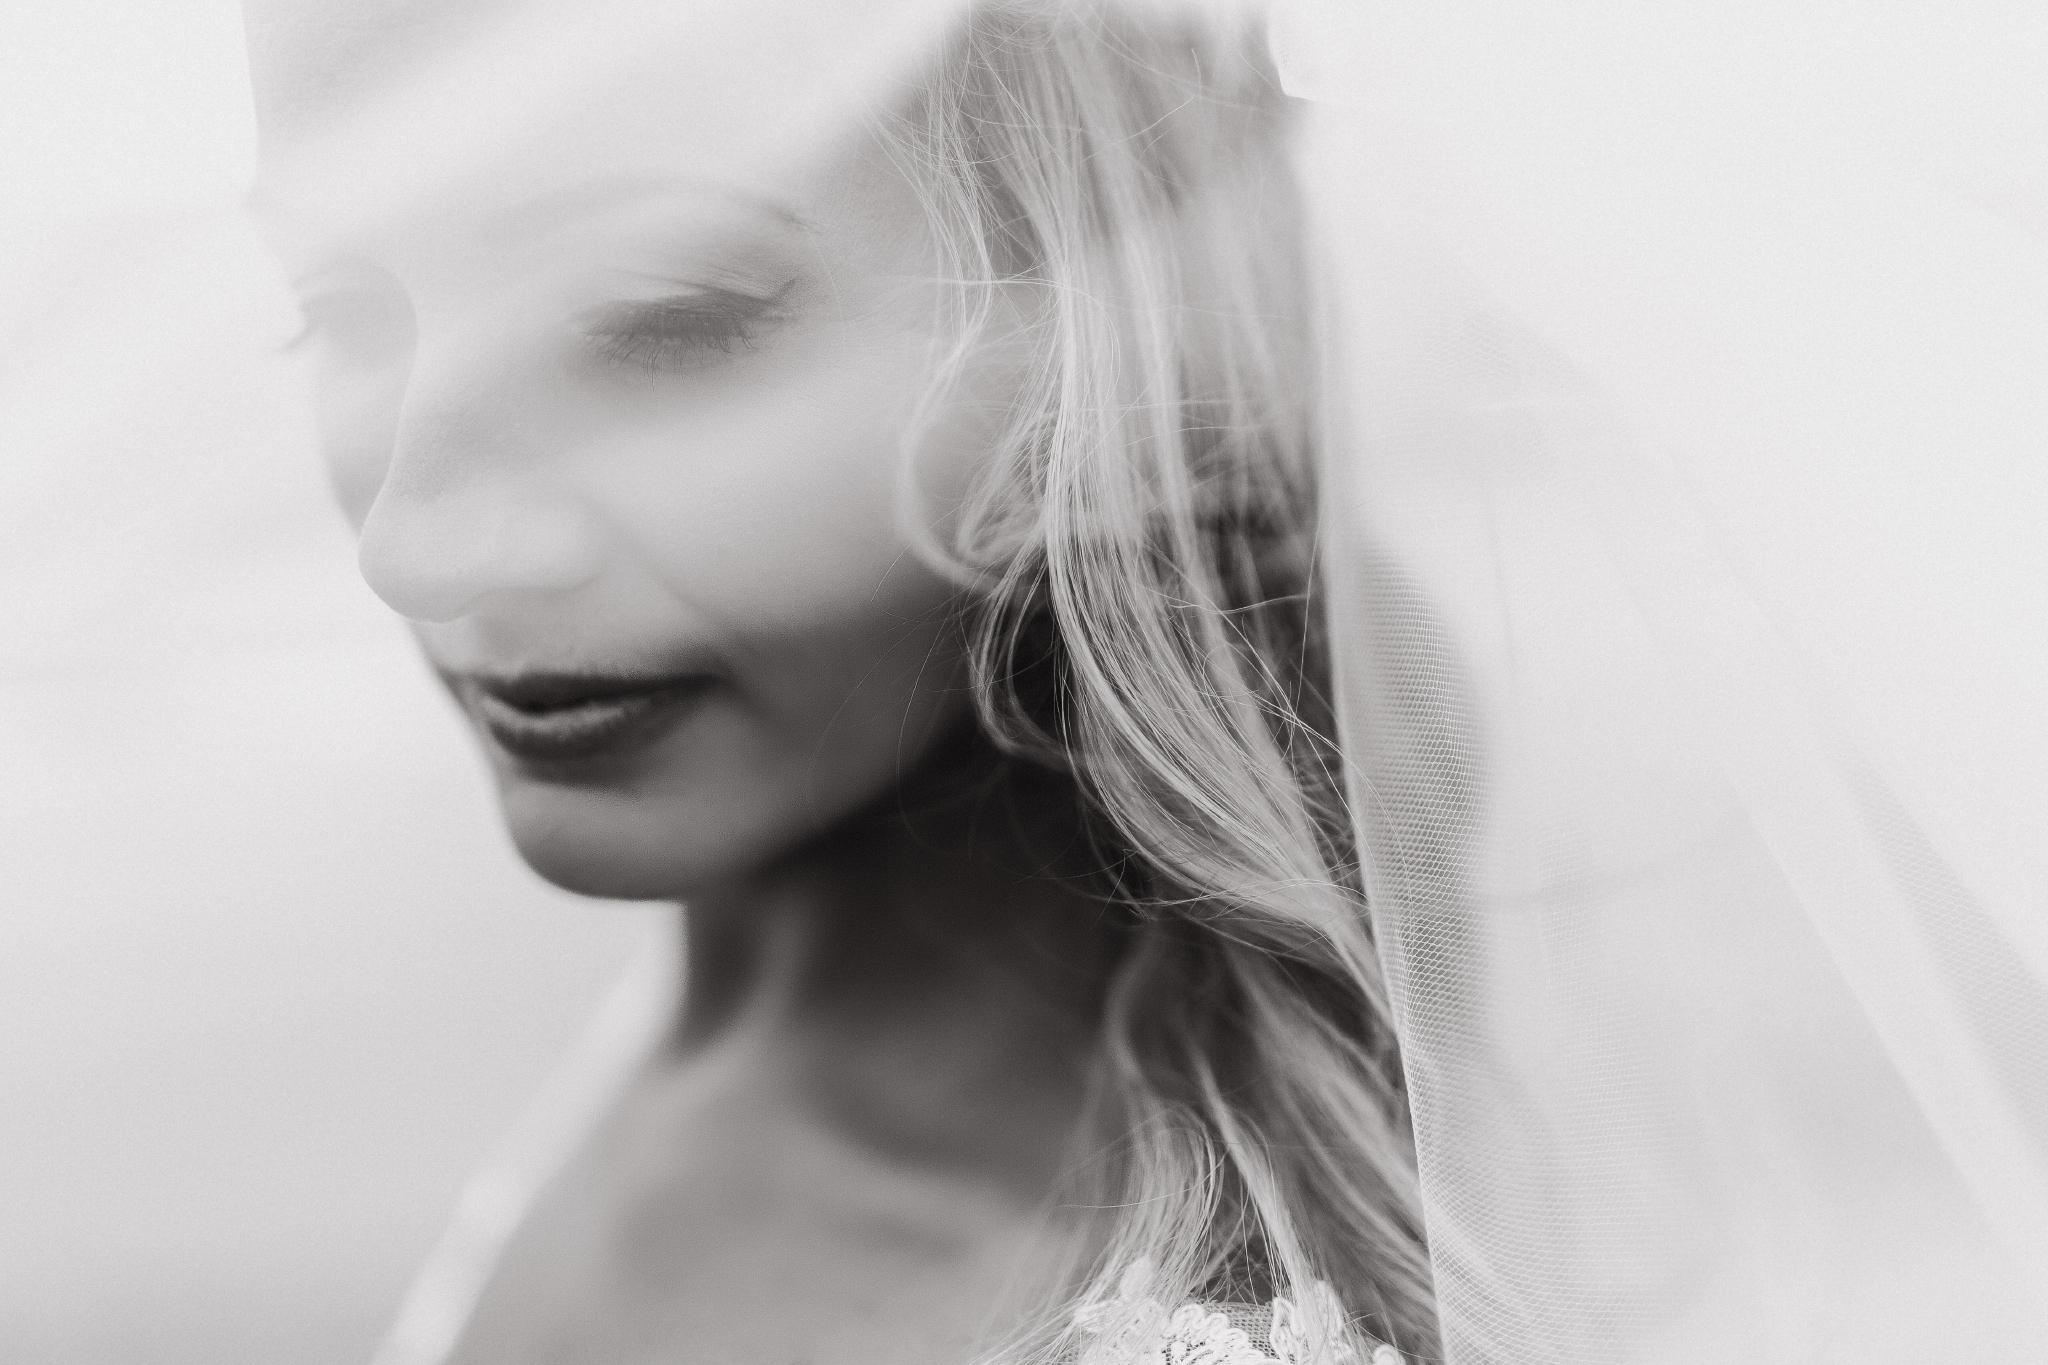 san diego wedding   photographer | black and white shot of woman in white dress seen through a   thin veil